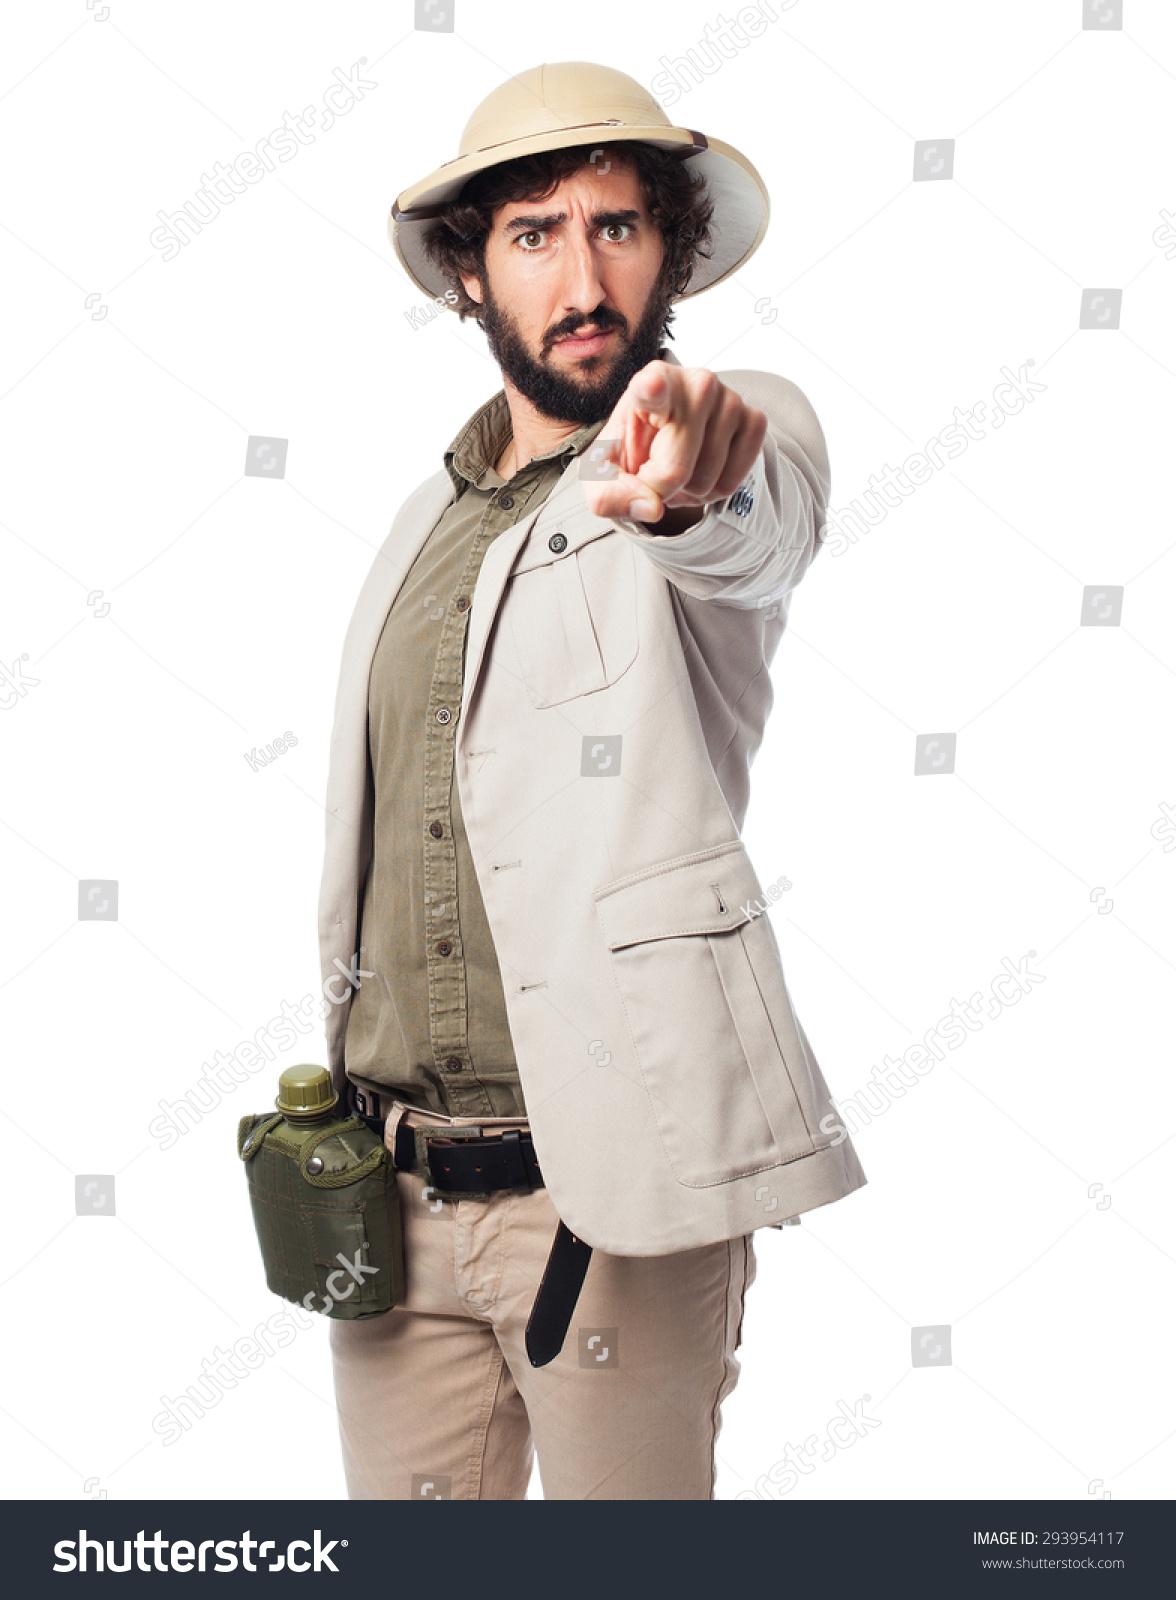 Crazy Explorer Man Rope Stock Photo 293957174 - Shutterstock